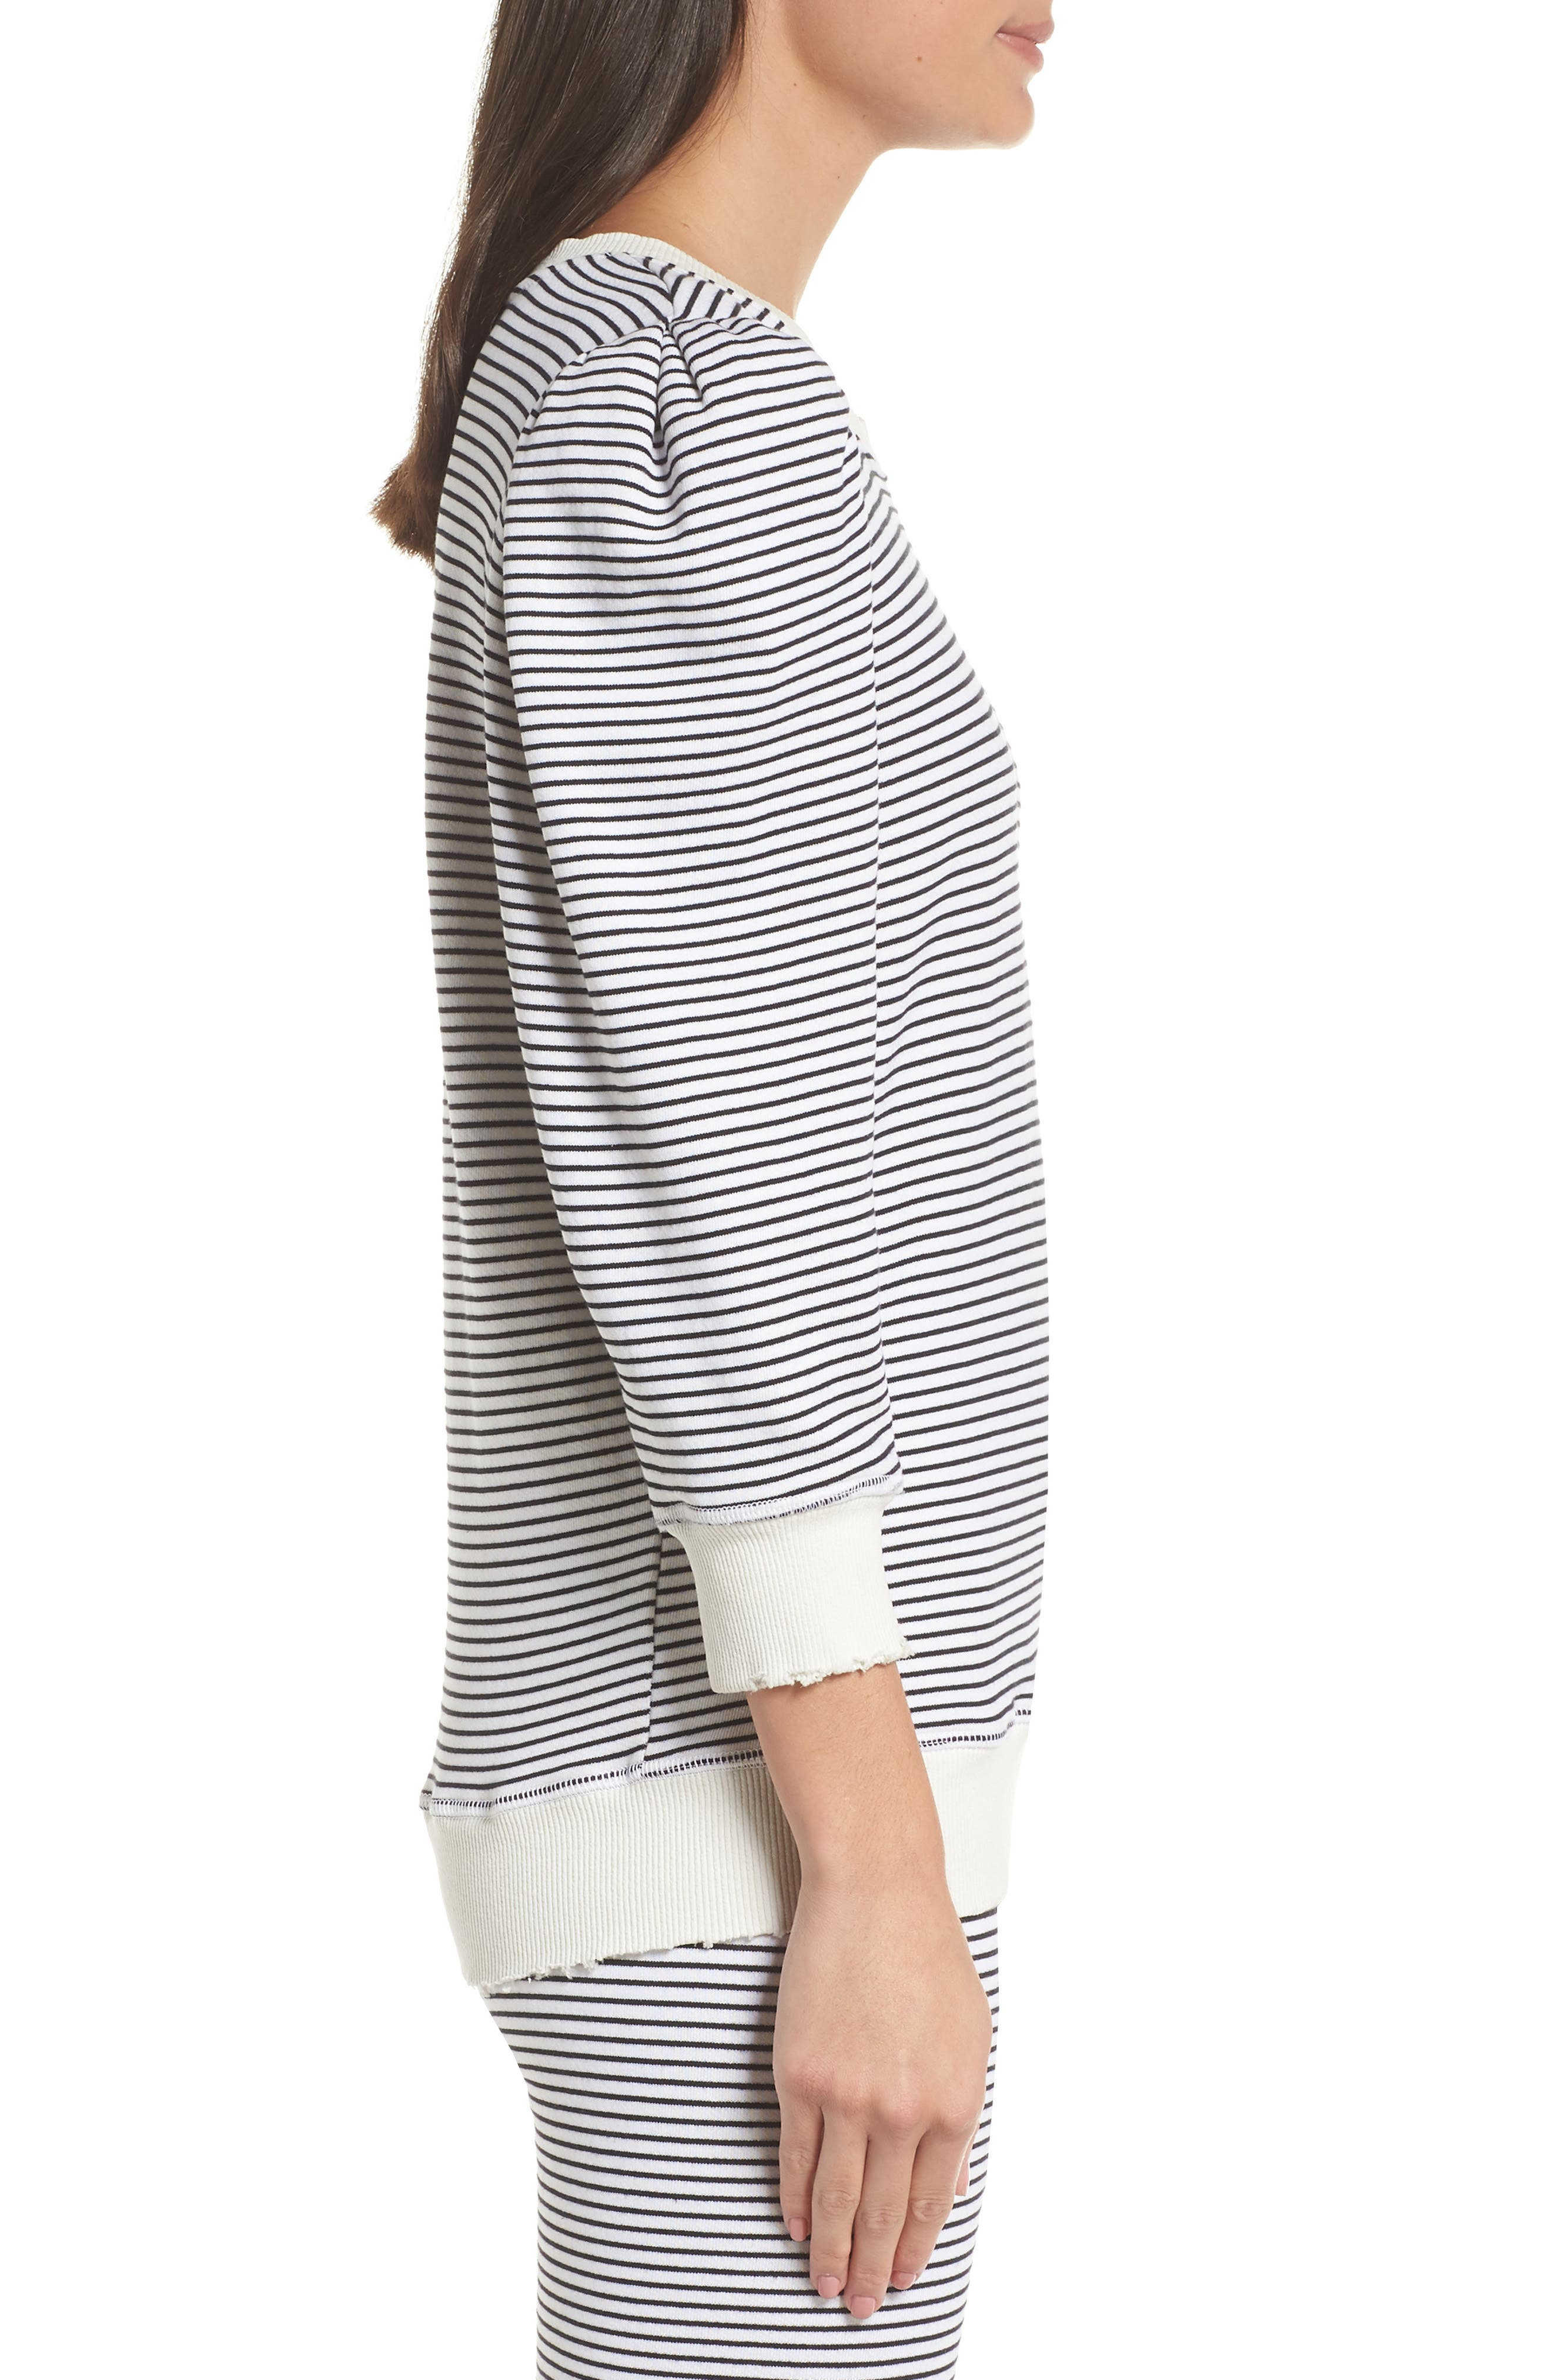 Leg of Mutton Sleeve Pullover,                             Alternate thumbnail 3, color,                             BLACK/ WHITE